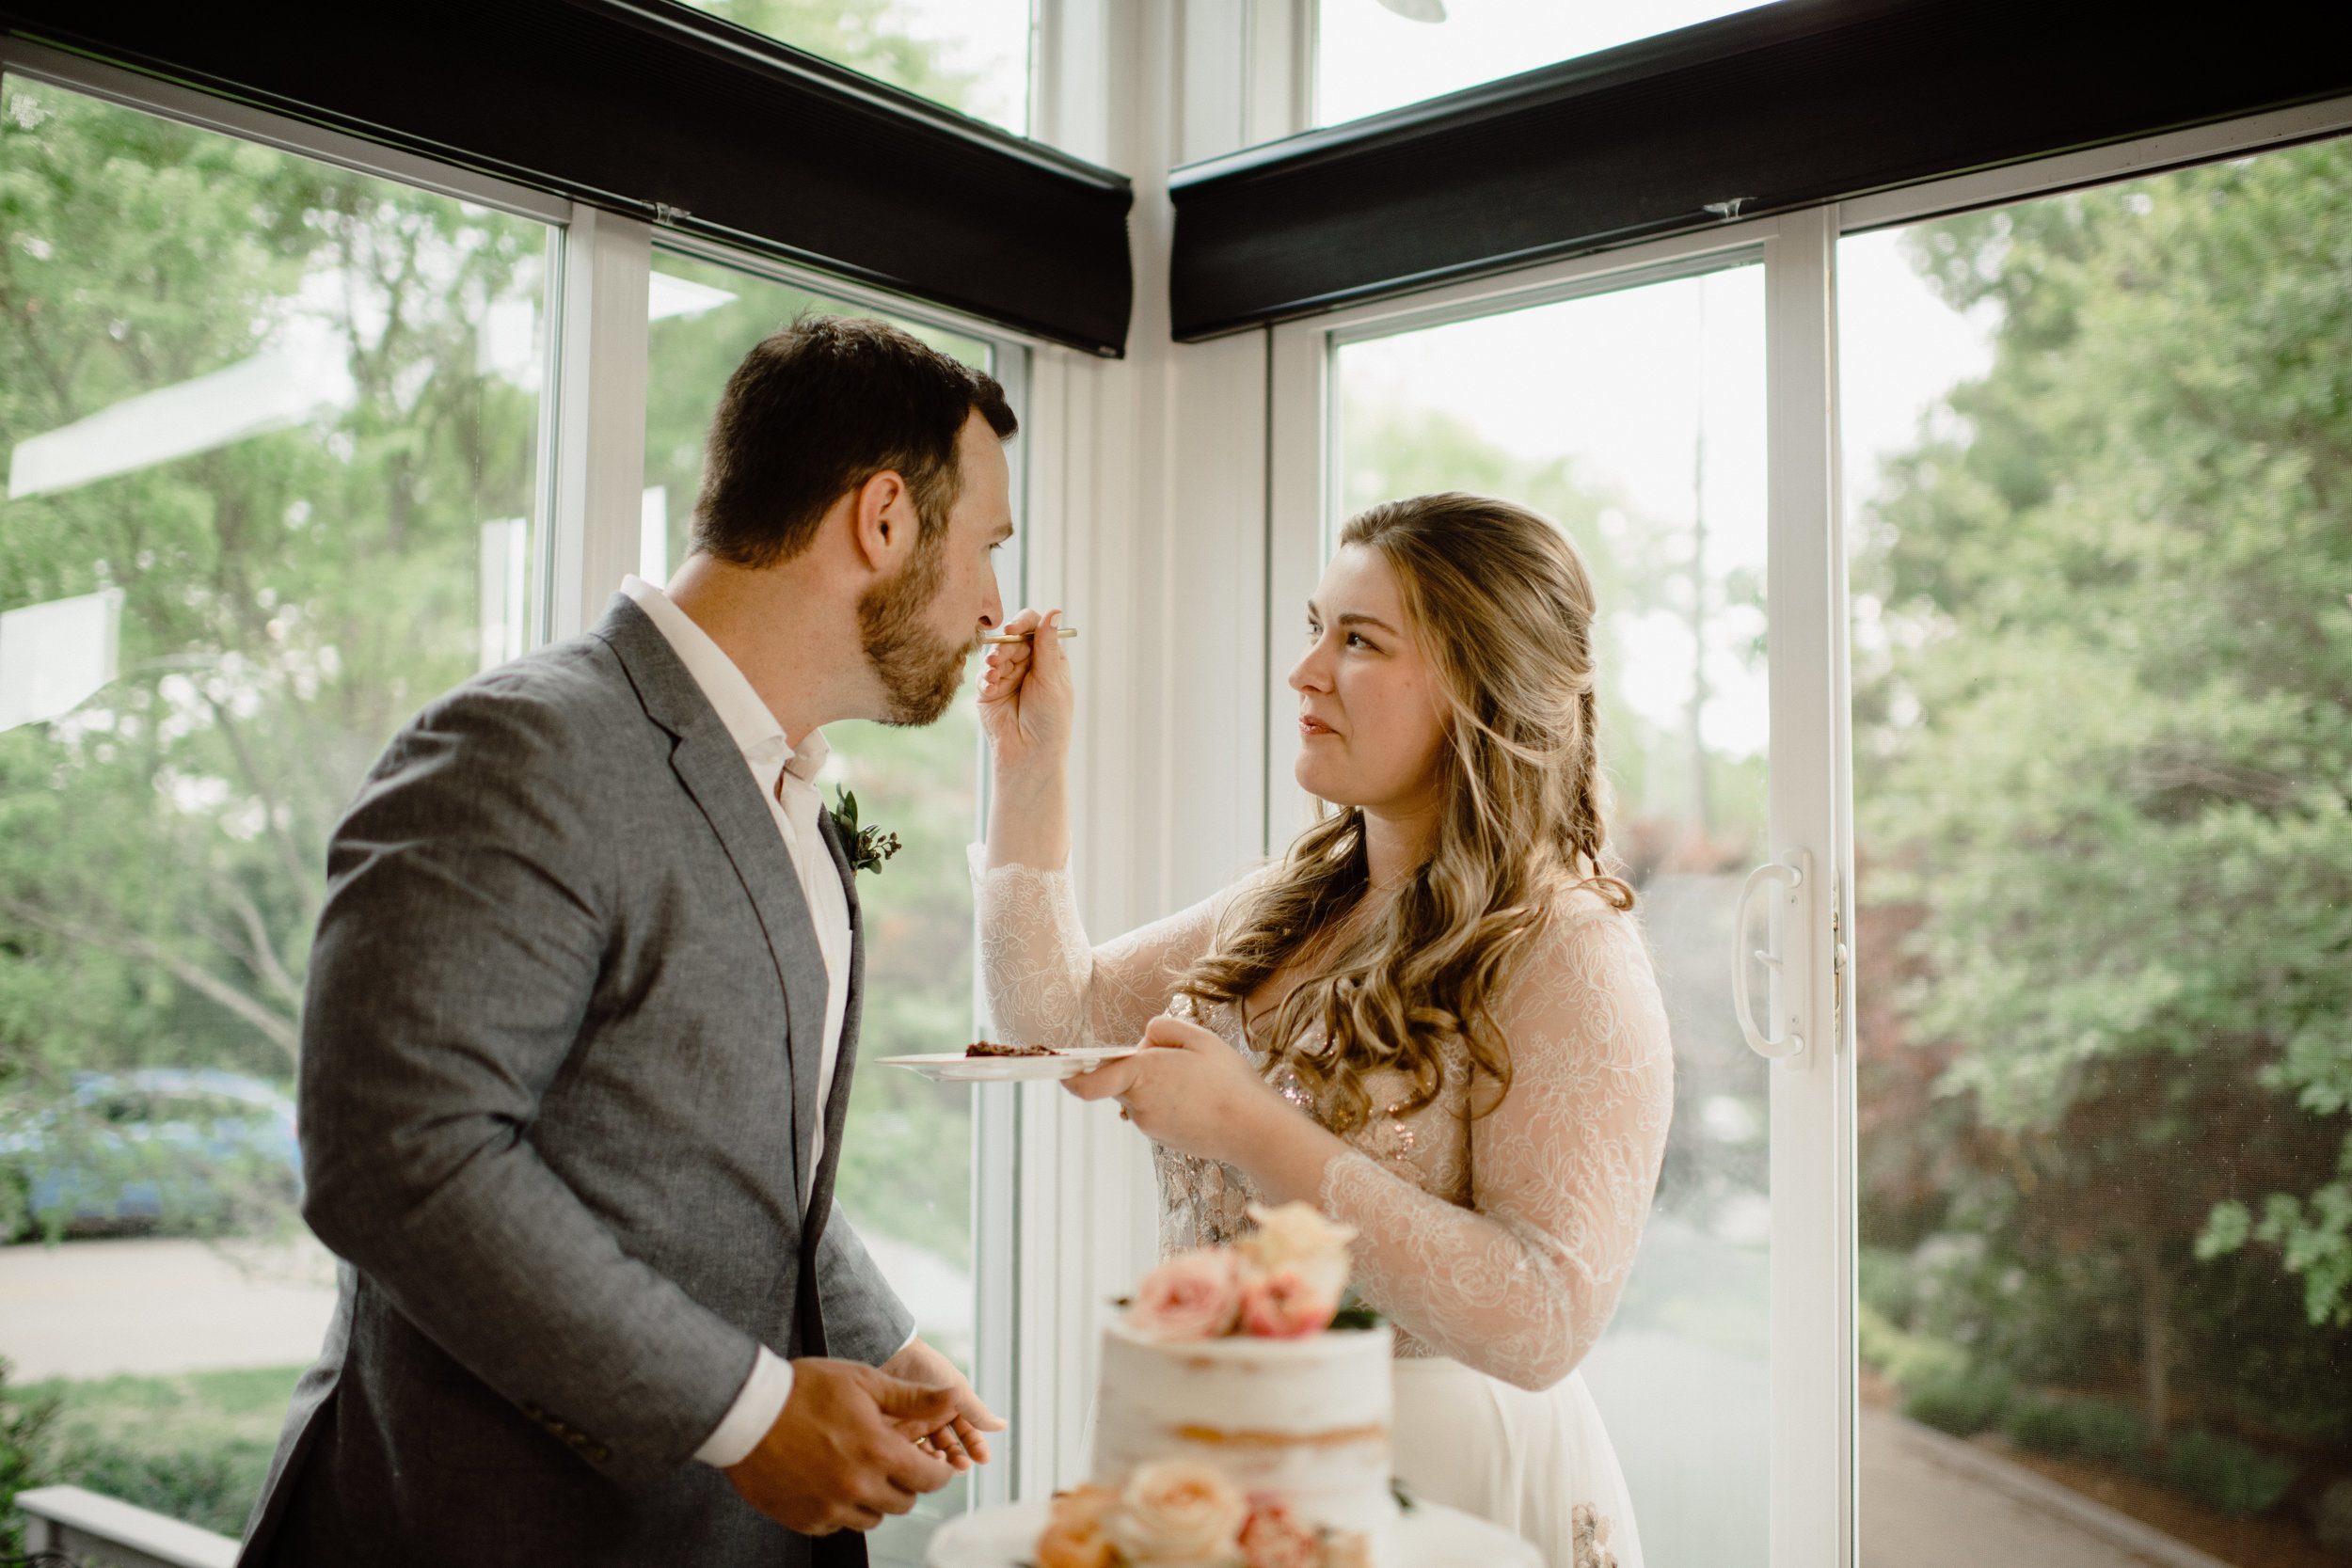 Elizabeth and Aldens Intimate Backyard wedding in Nashville Tennessee Wedding Photographer00018.jpg